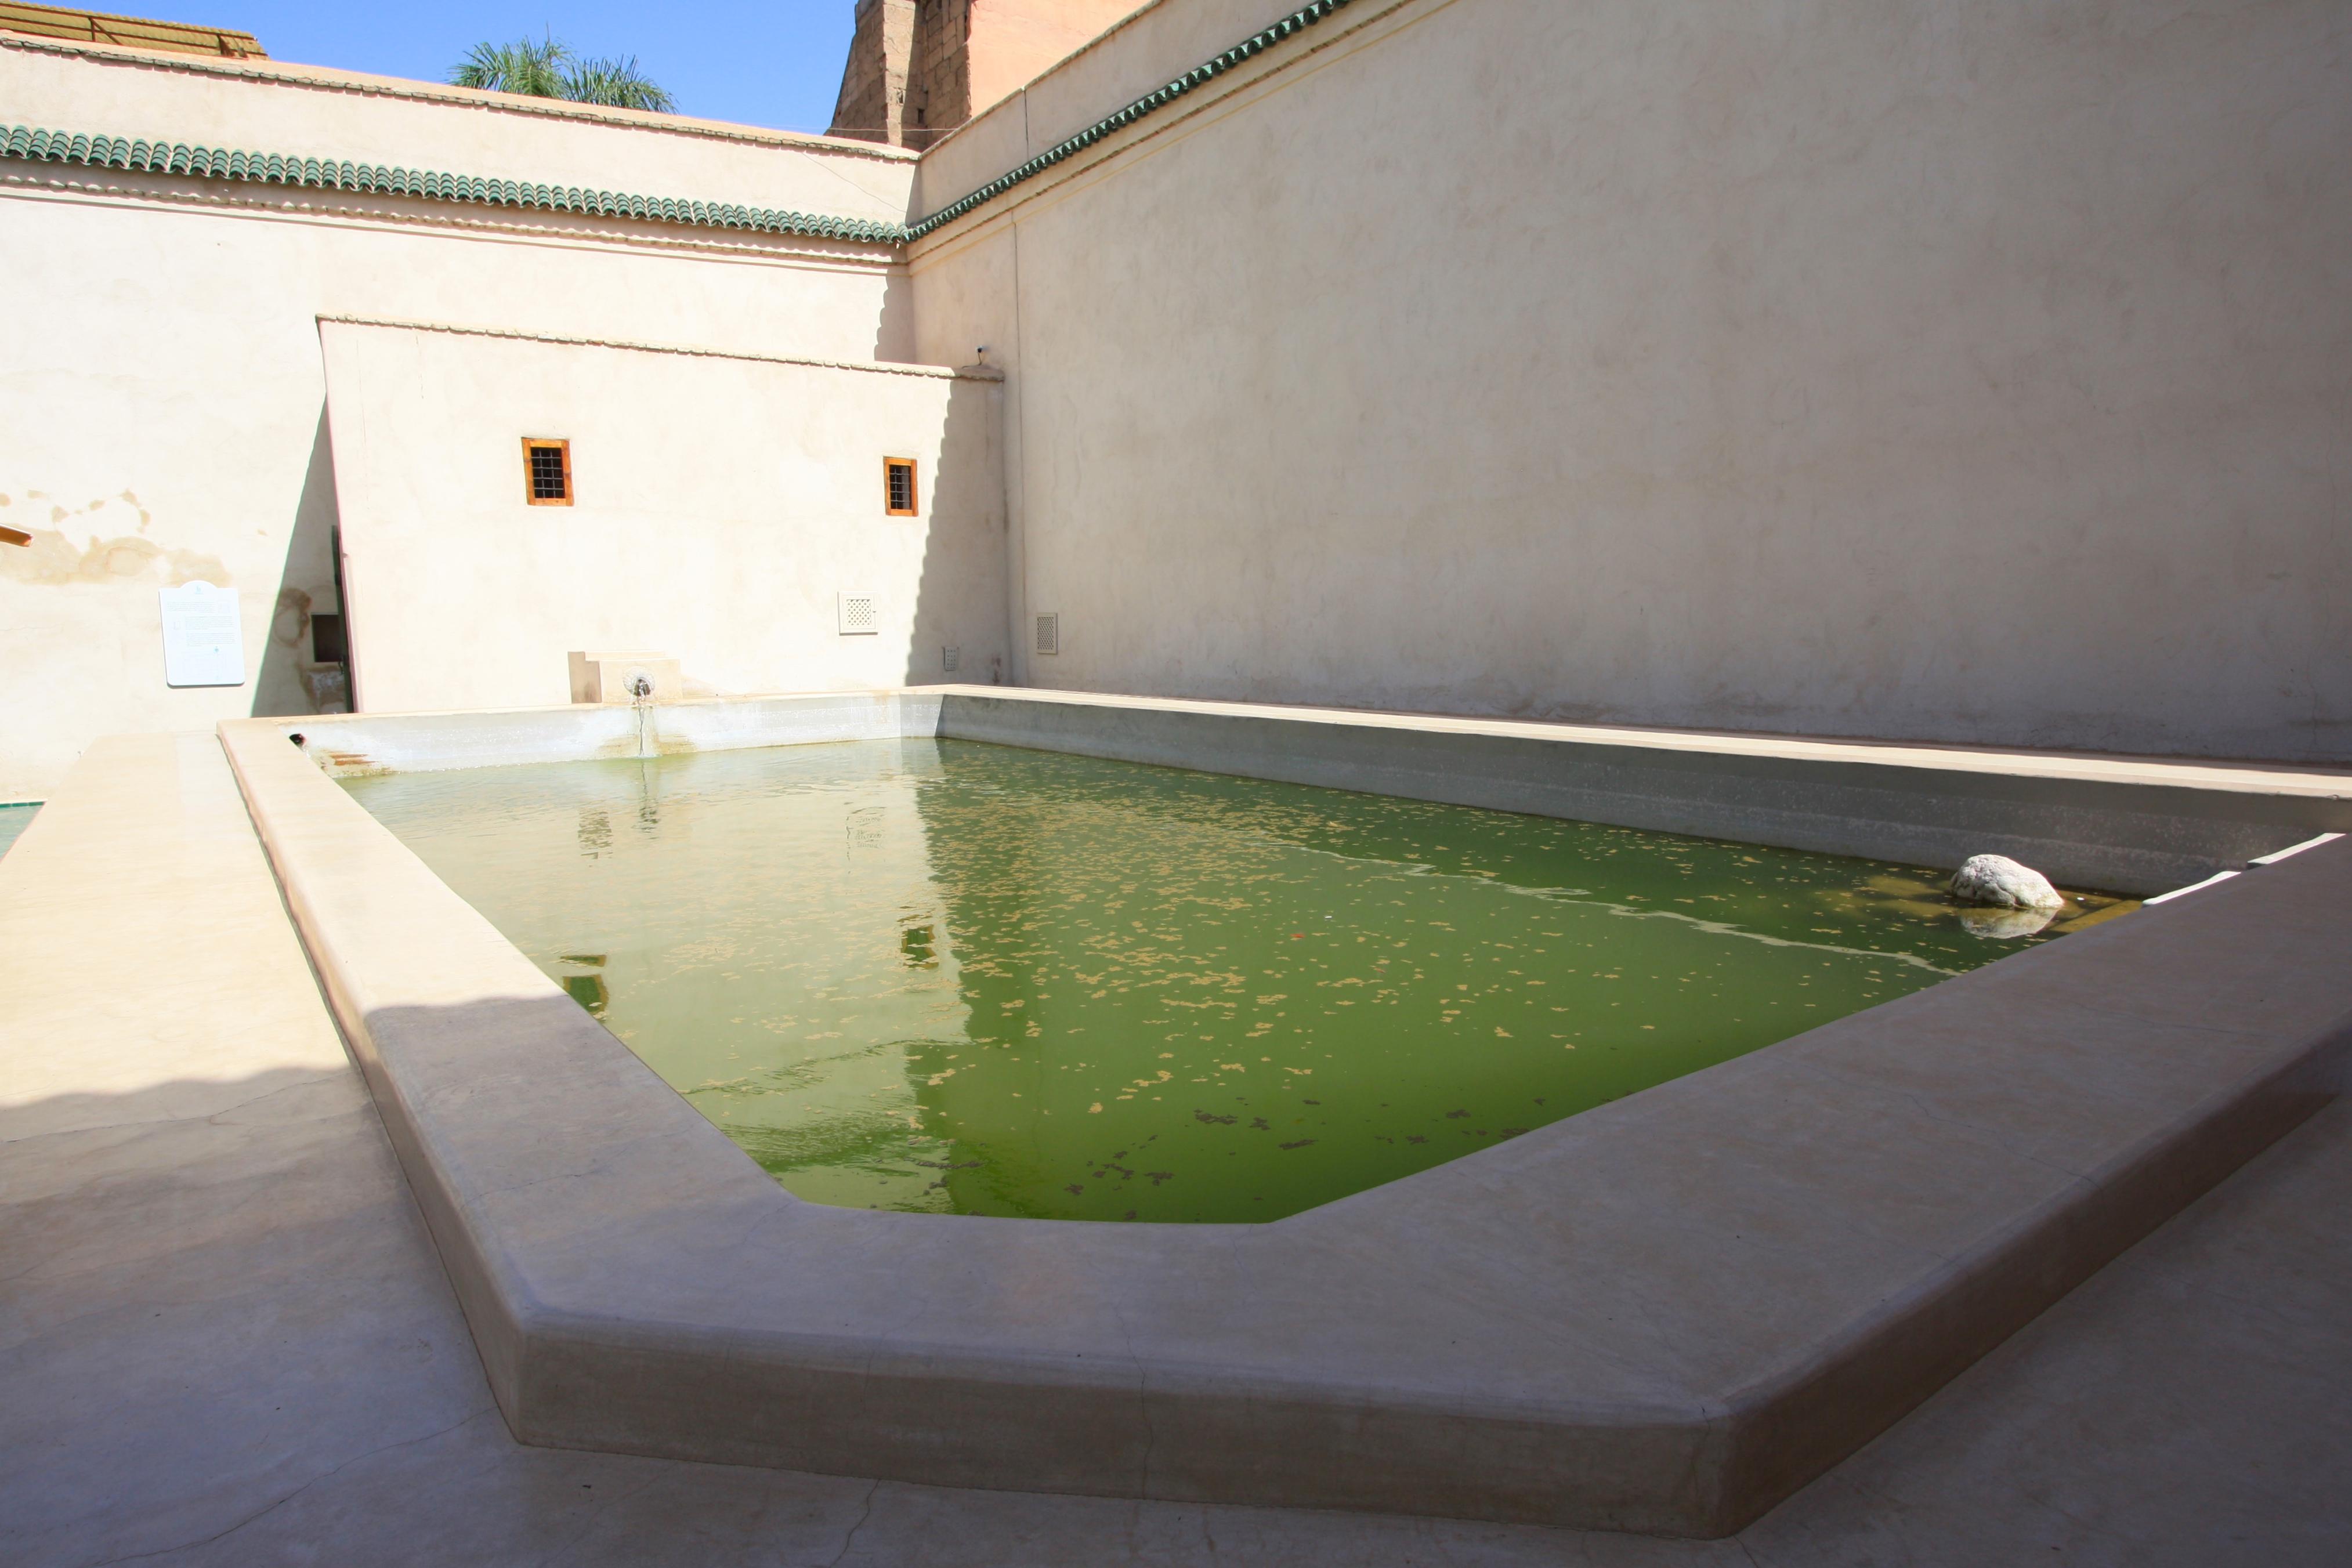 Le Jardin Secret Marrakech – The Frustrated Gardener